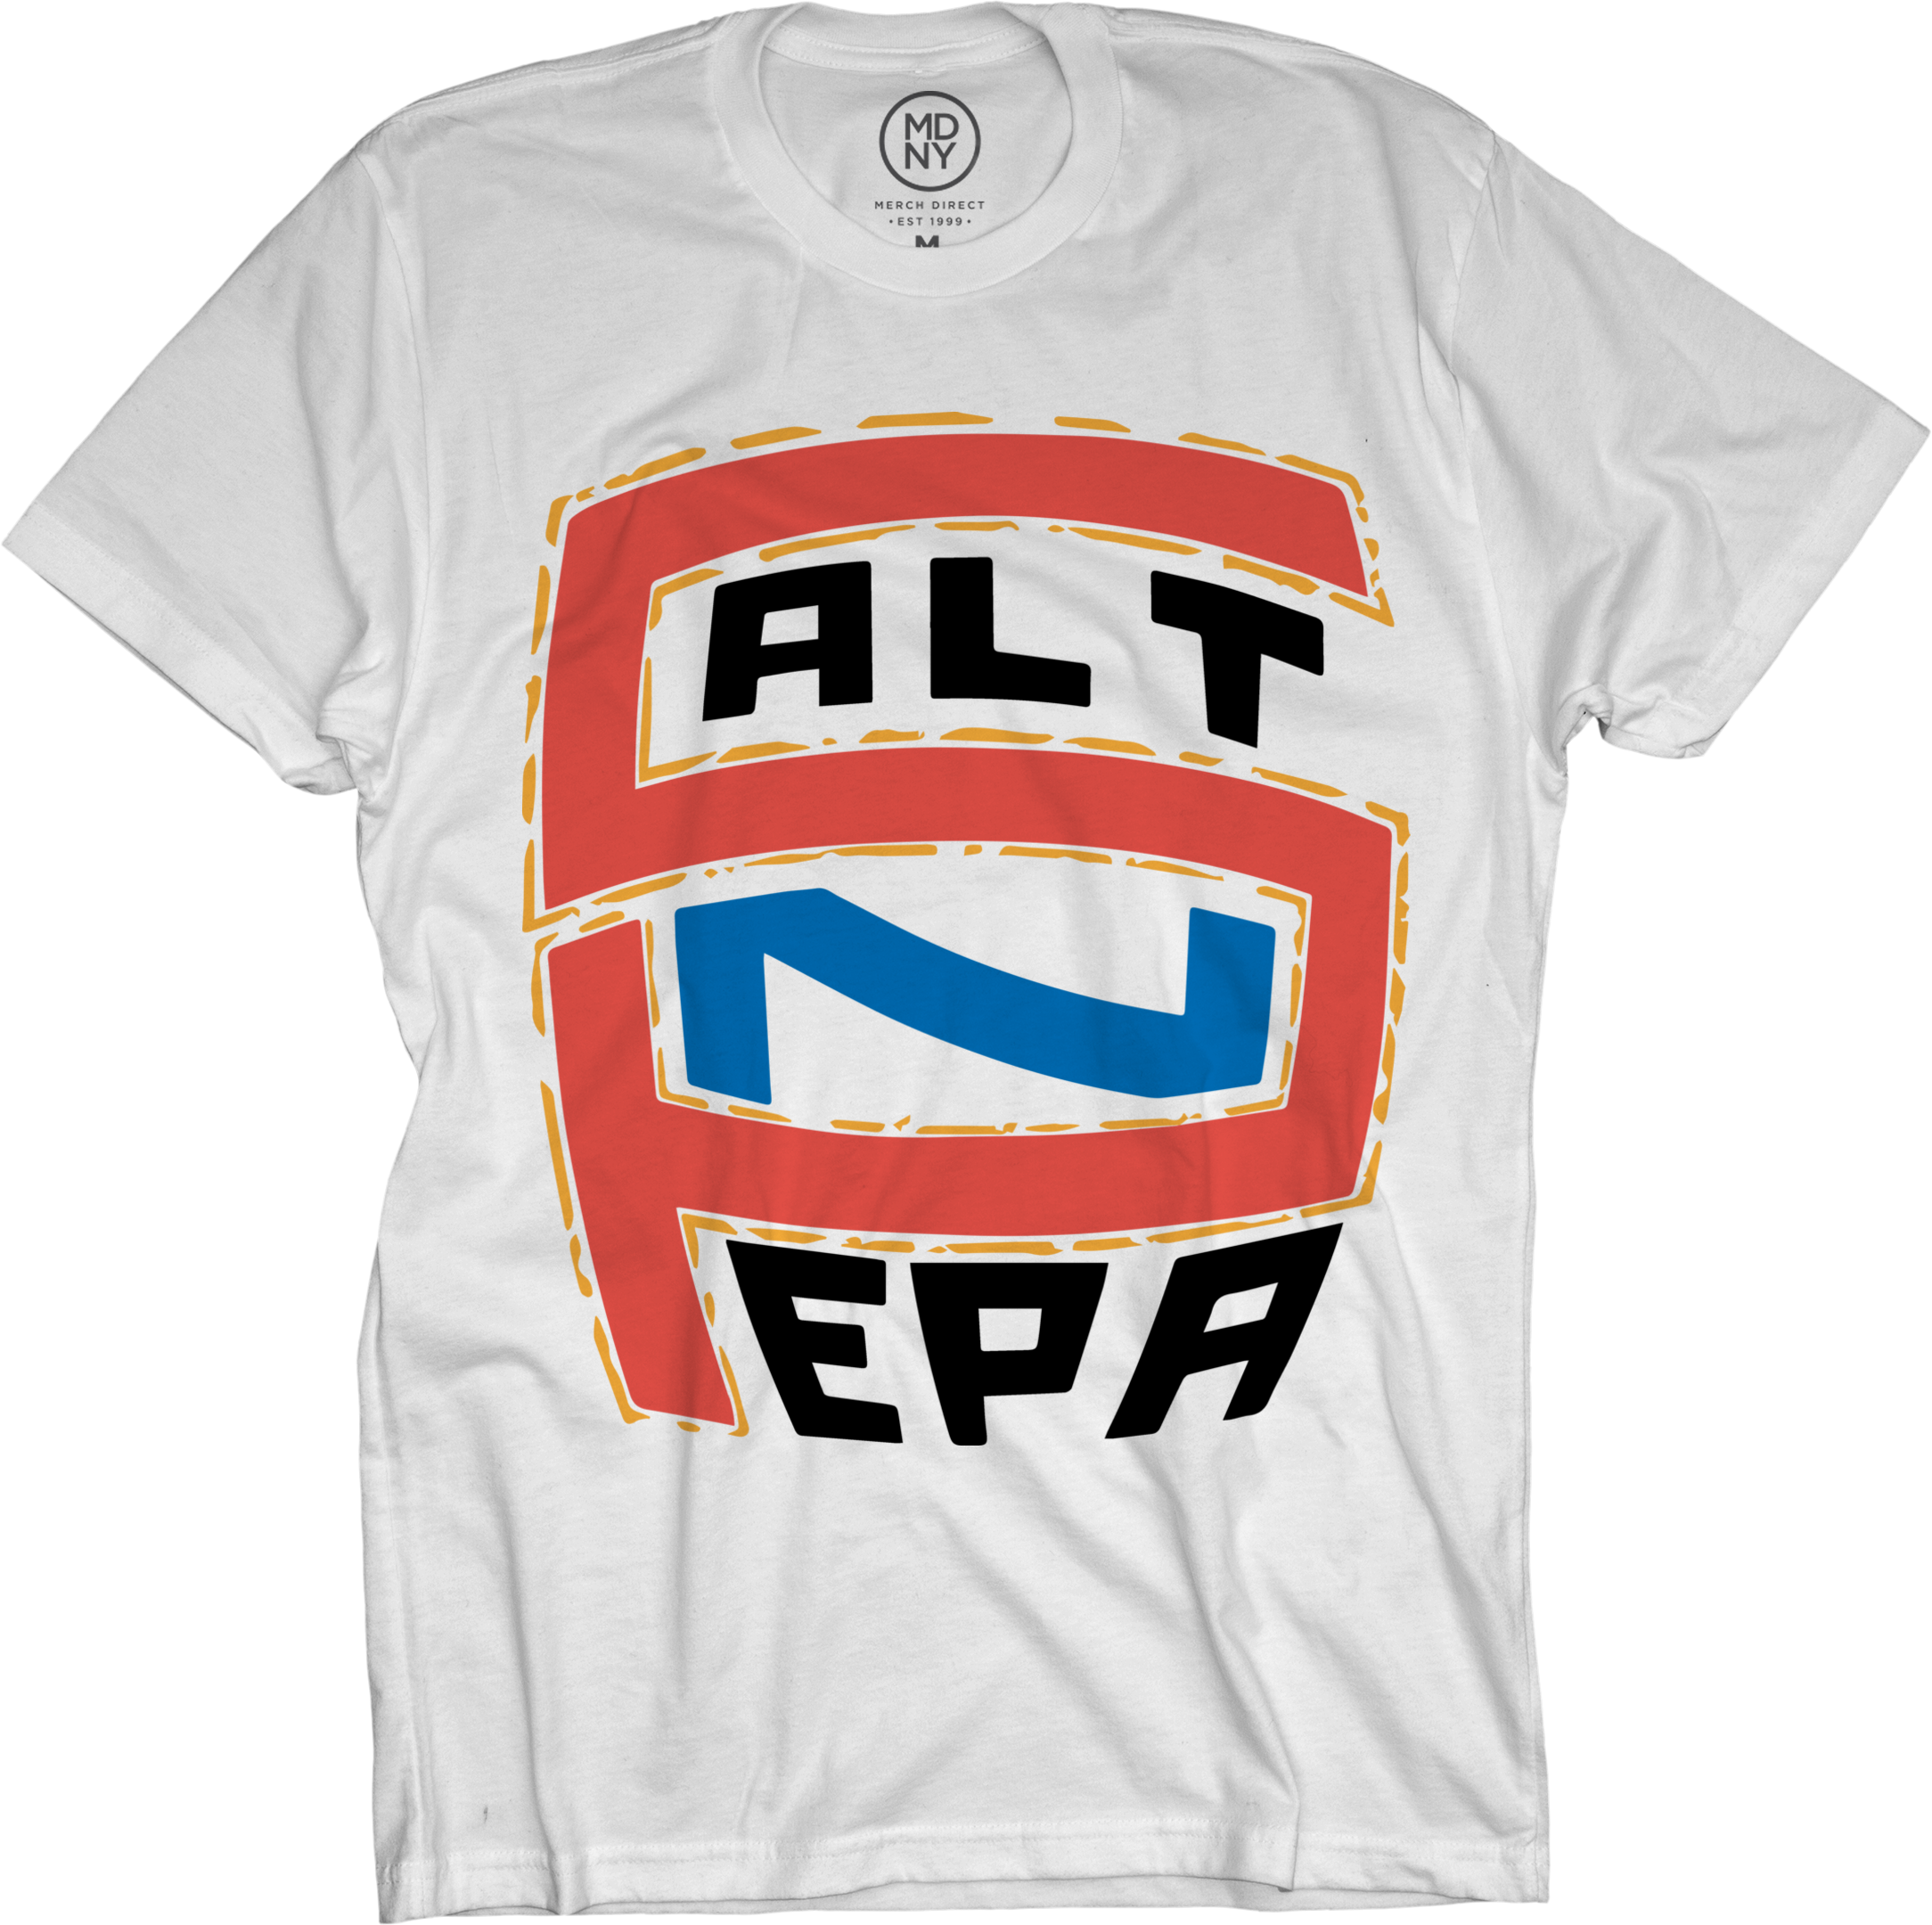 Red & Blue Logo on White T-Shirt